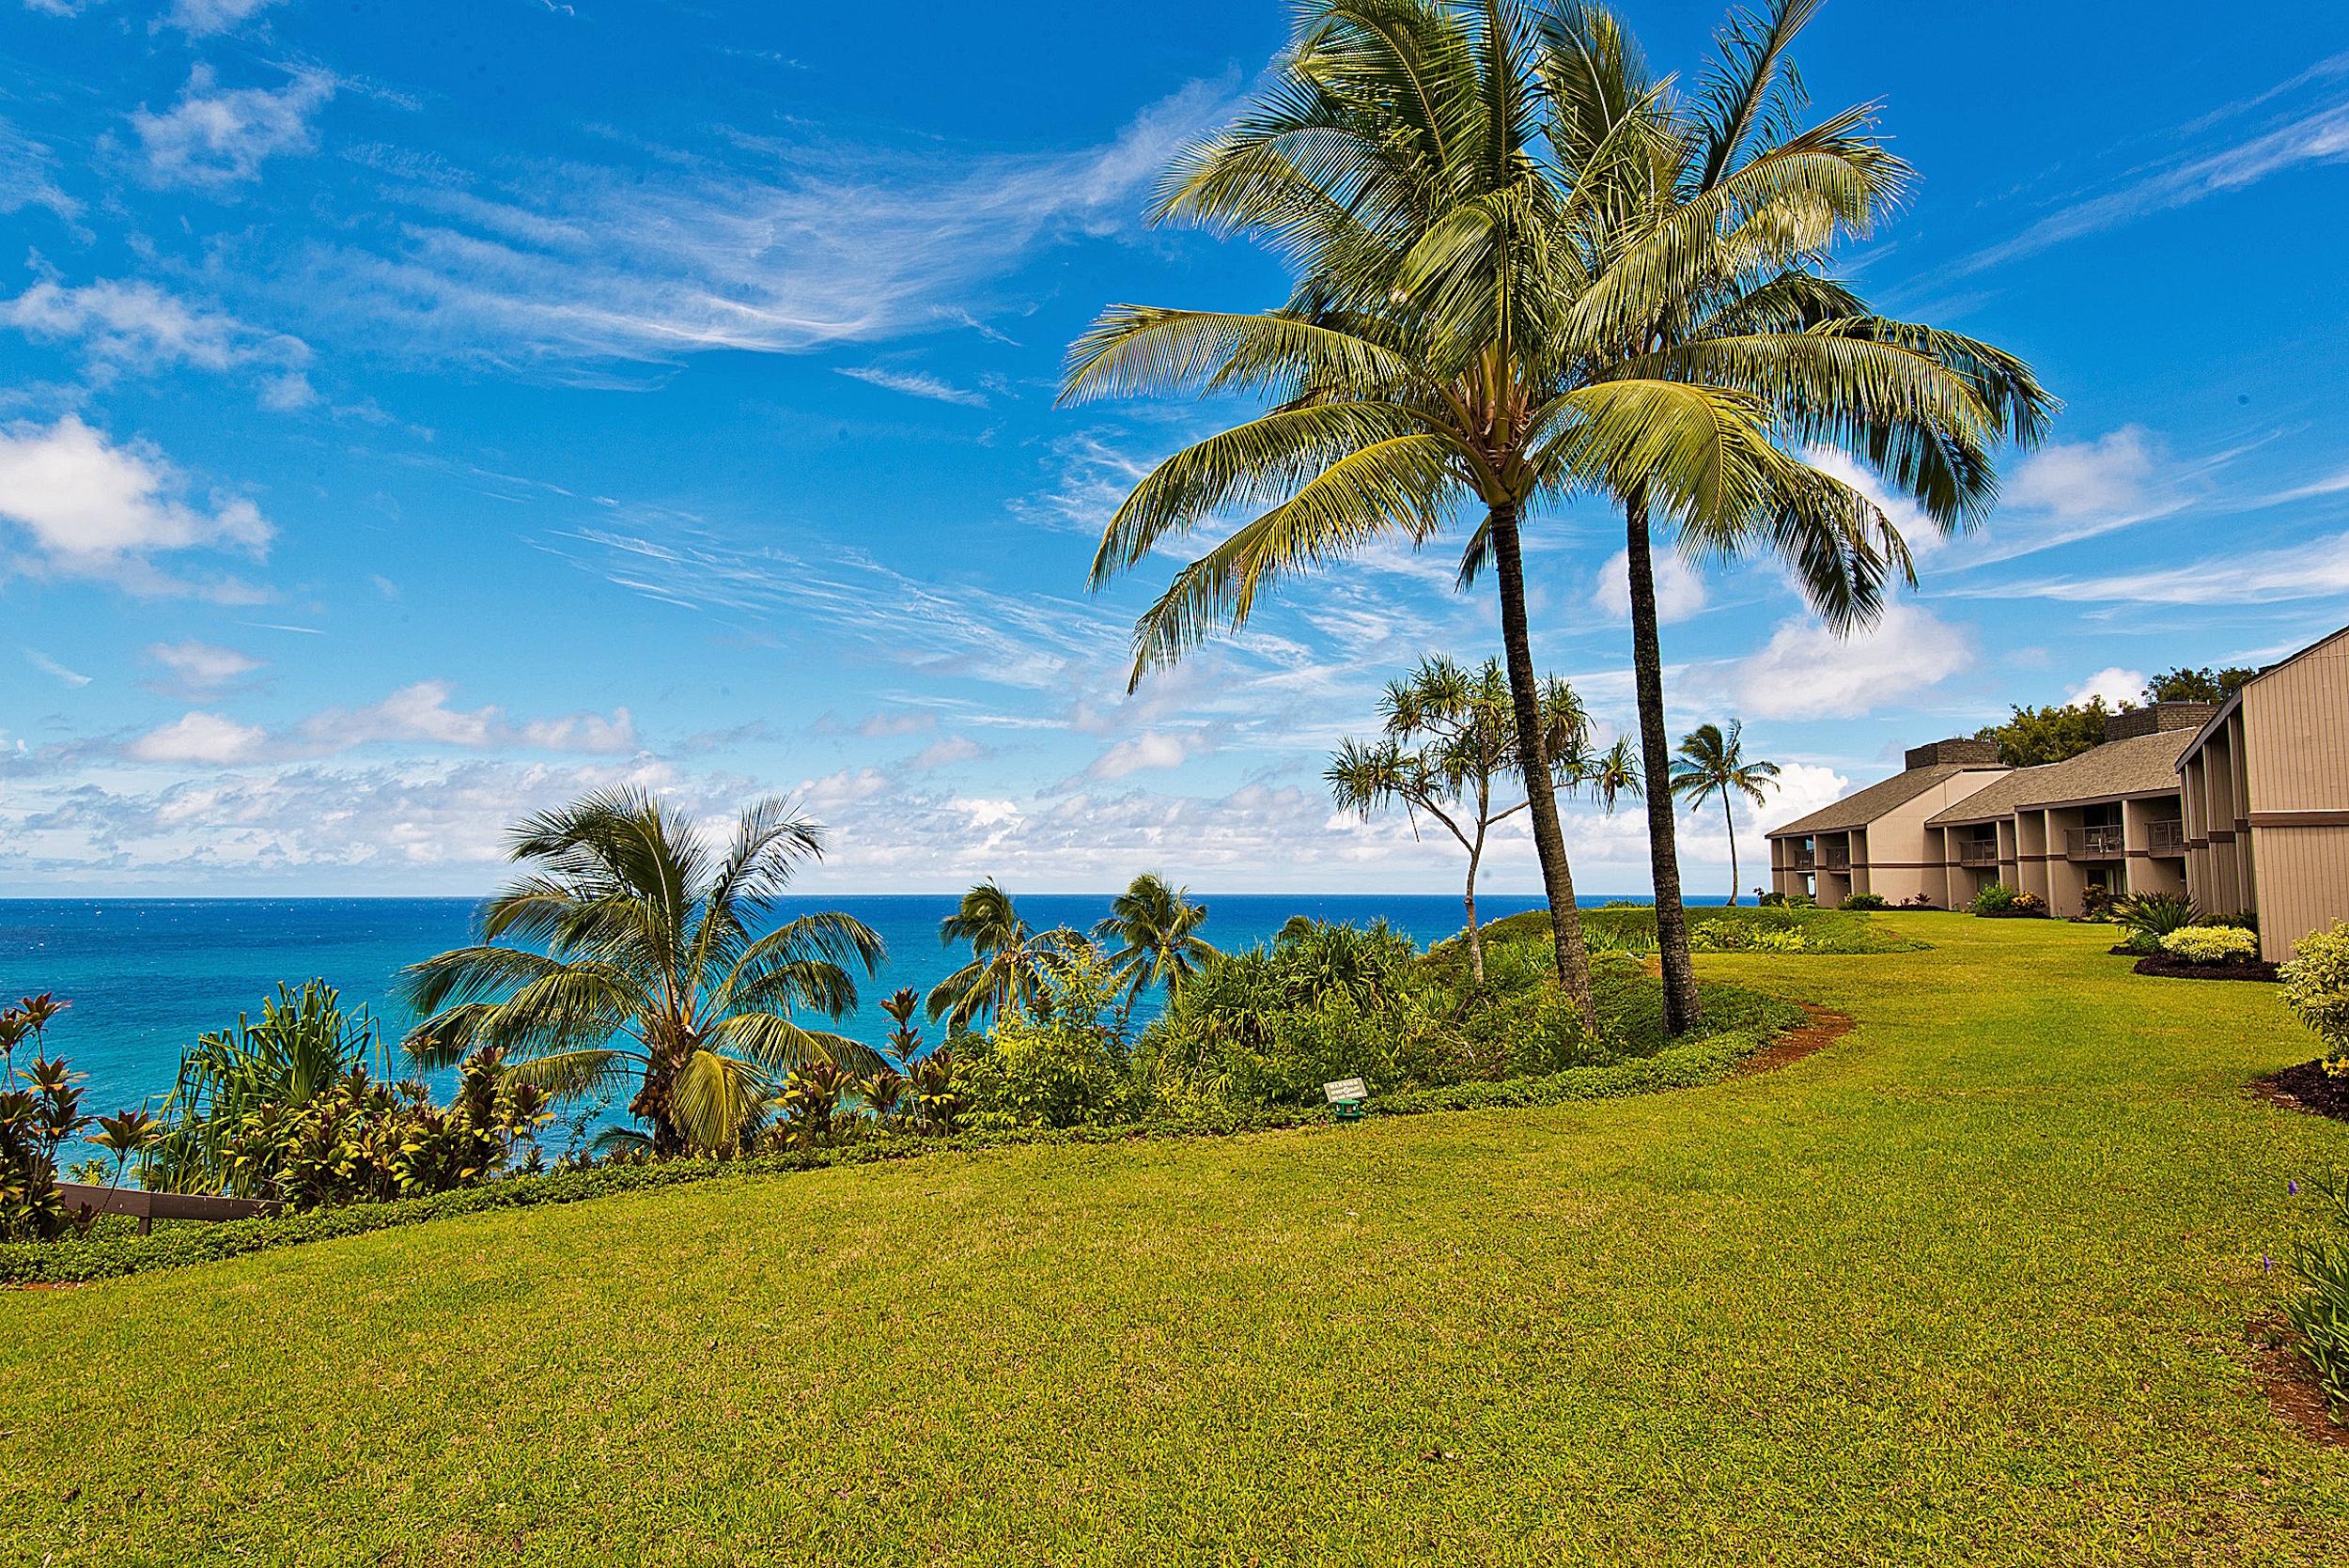 Condominio por un Venta en Pali Ke Kua 5300 Ka Haku Rd #107 Princeville, Hawaii, 96722 Estados Unidos